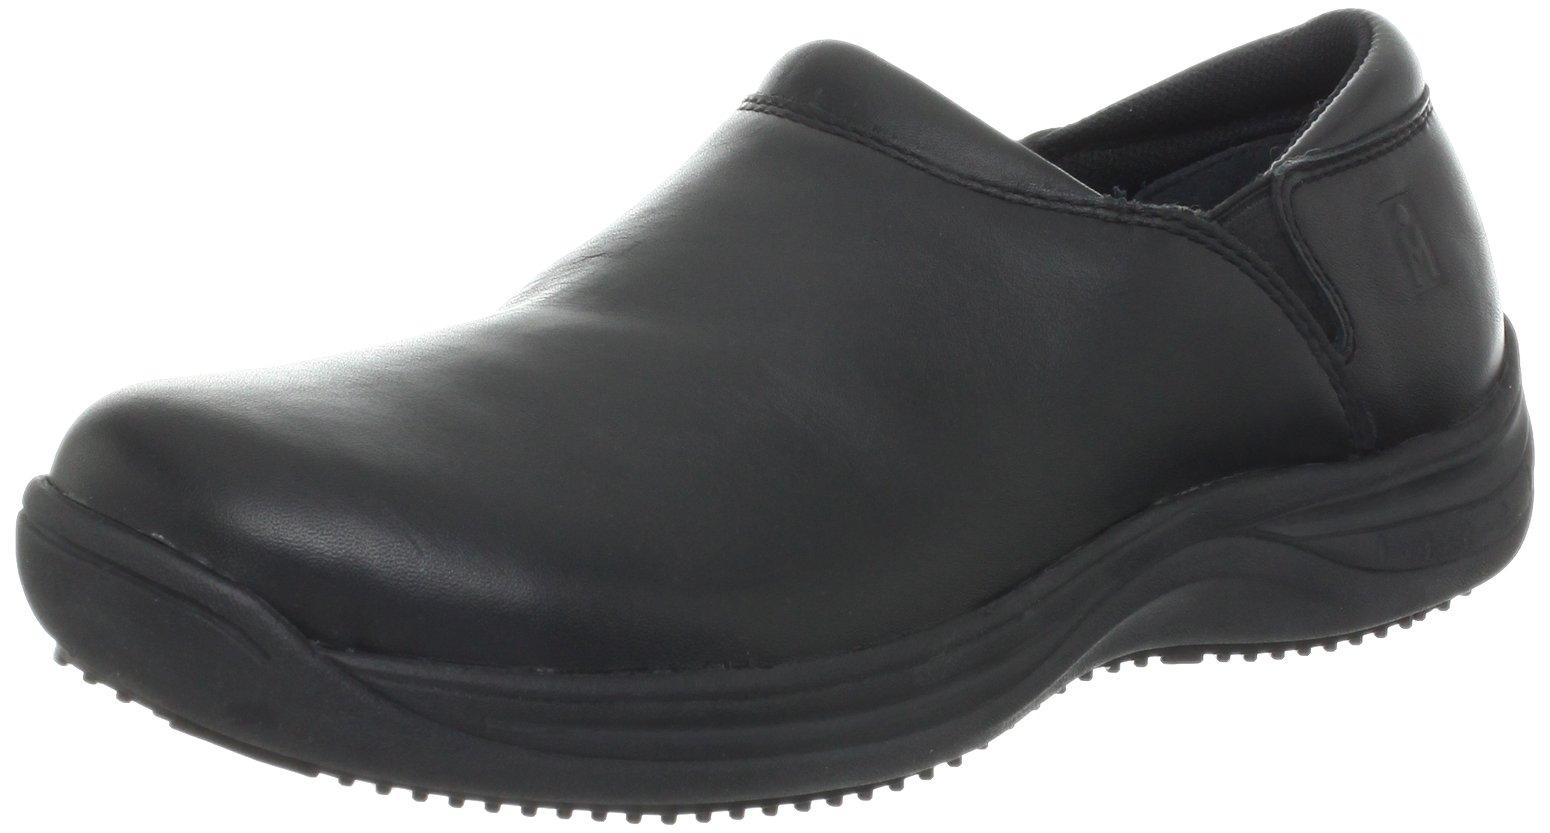 MOZO Women's Forza Slip Resistant Work Clog,Black,9.5 M US